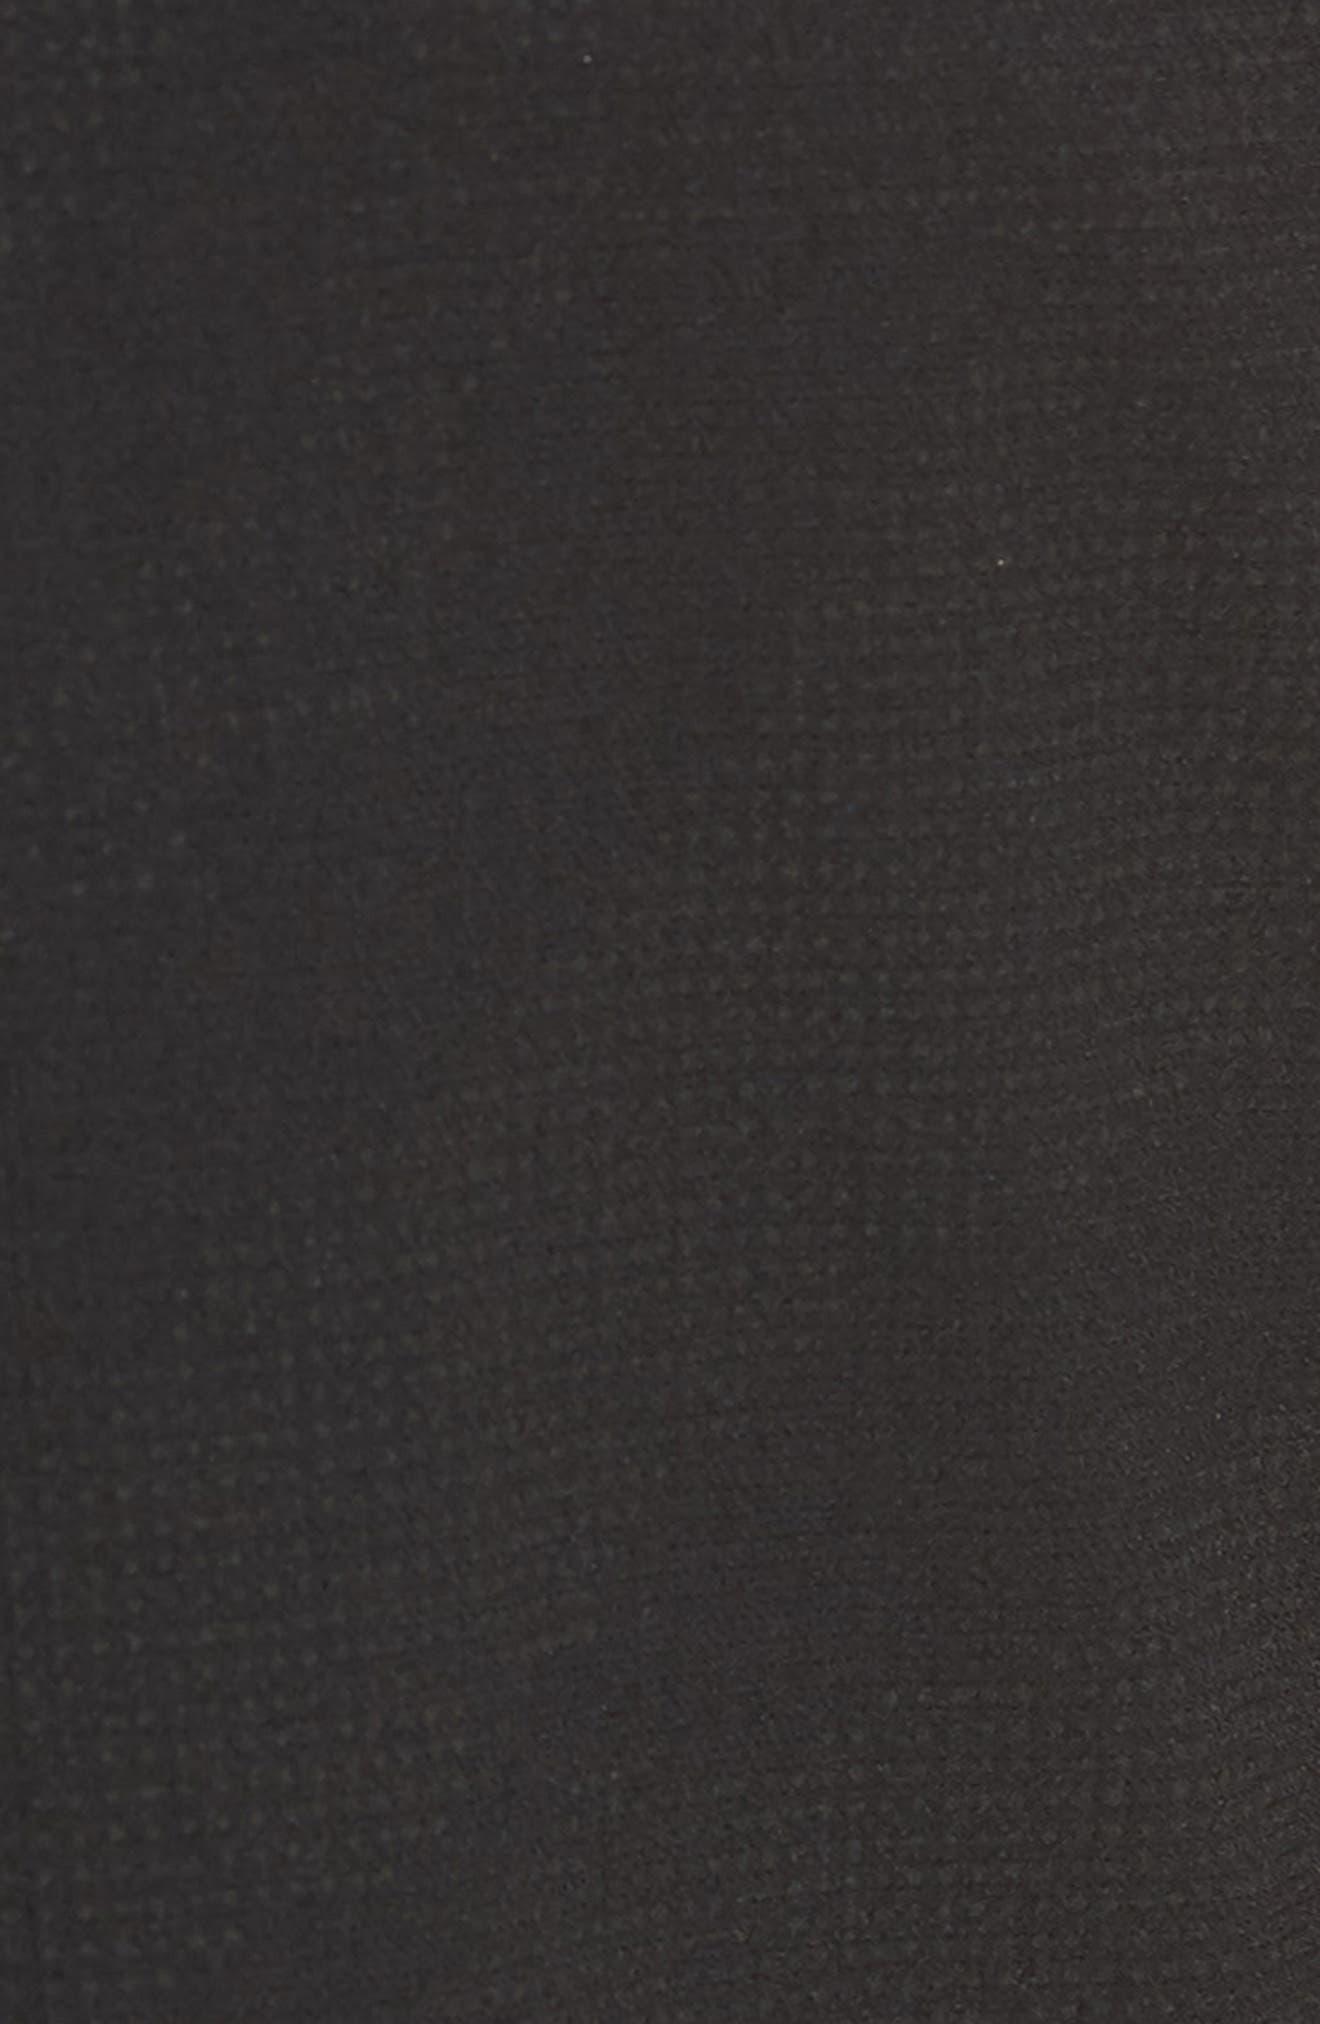 Camo Hype Reflective Regular Fit Shorts,                             Alternate thumbnail 4, color,                             001